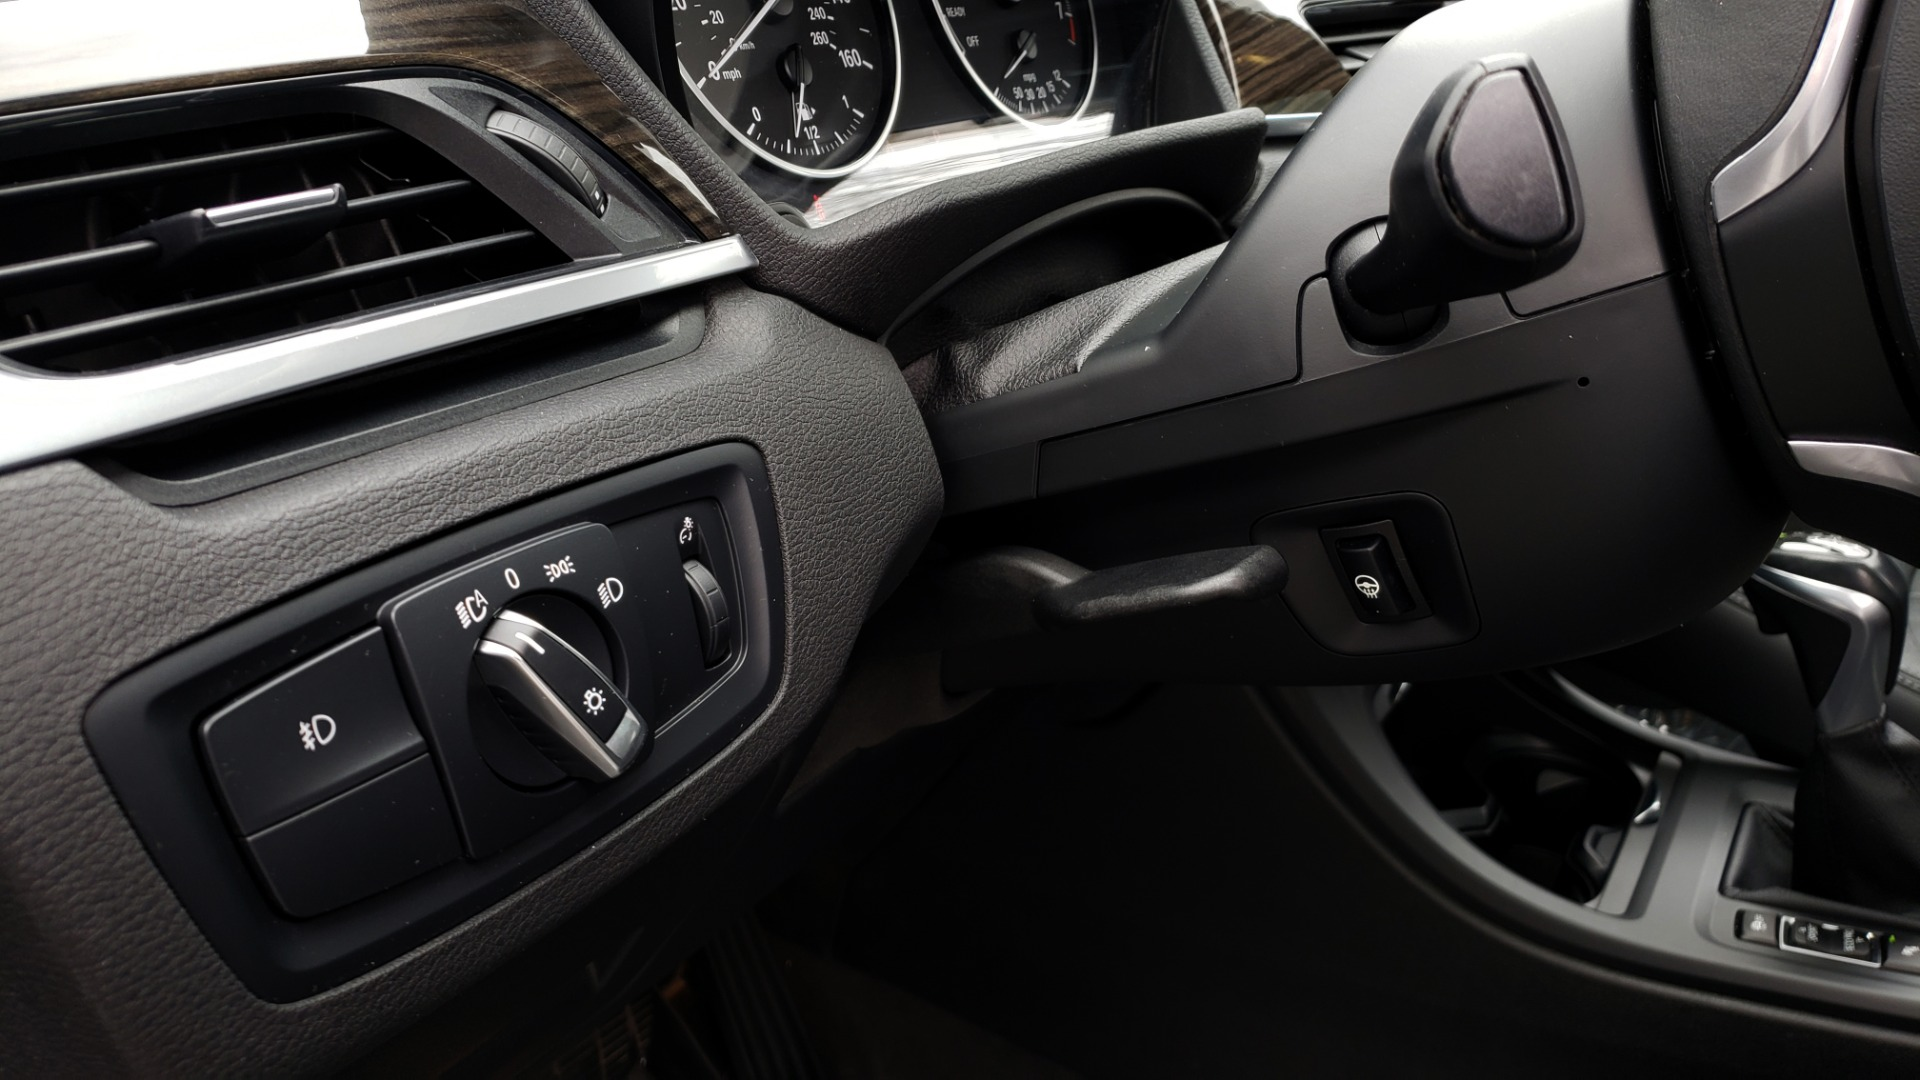 Used 2017 BMW X1 XDRIVE28I / PREM PKG / DRIVER ASST / NAV / CLD WTHR for sale Sold at Formula Imports in Charlotte NC 28227 36